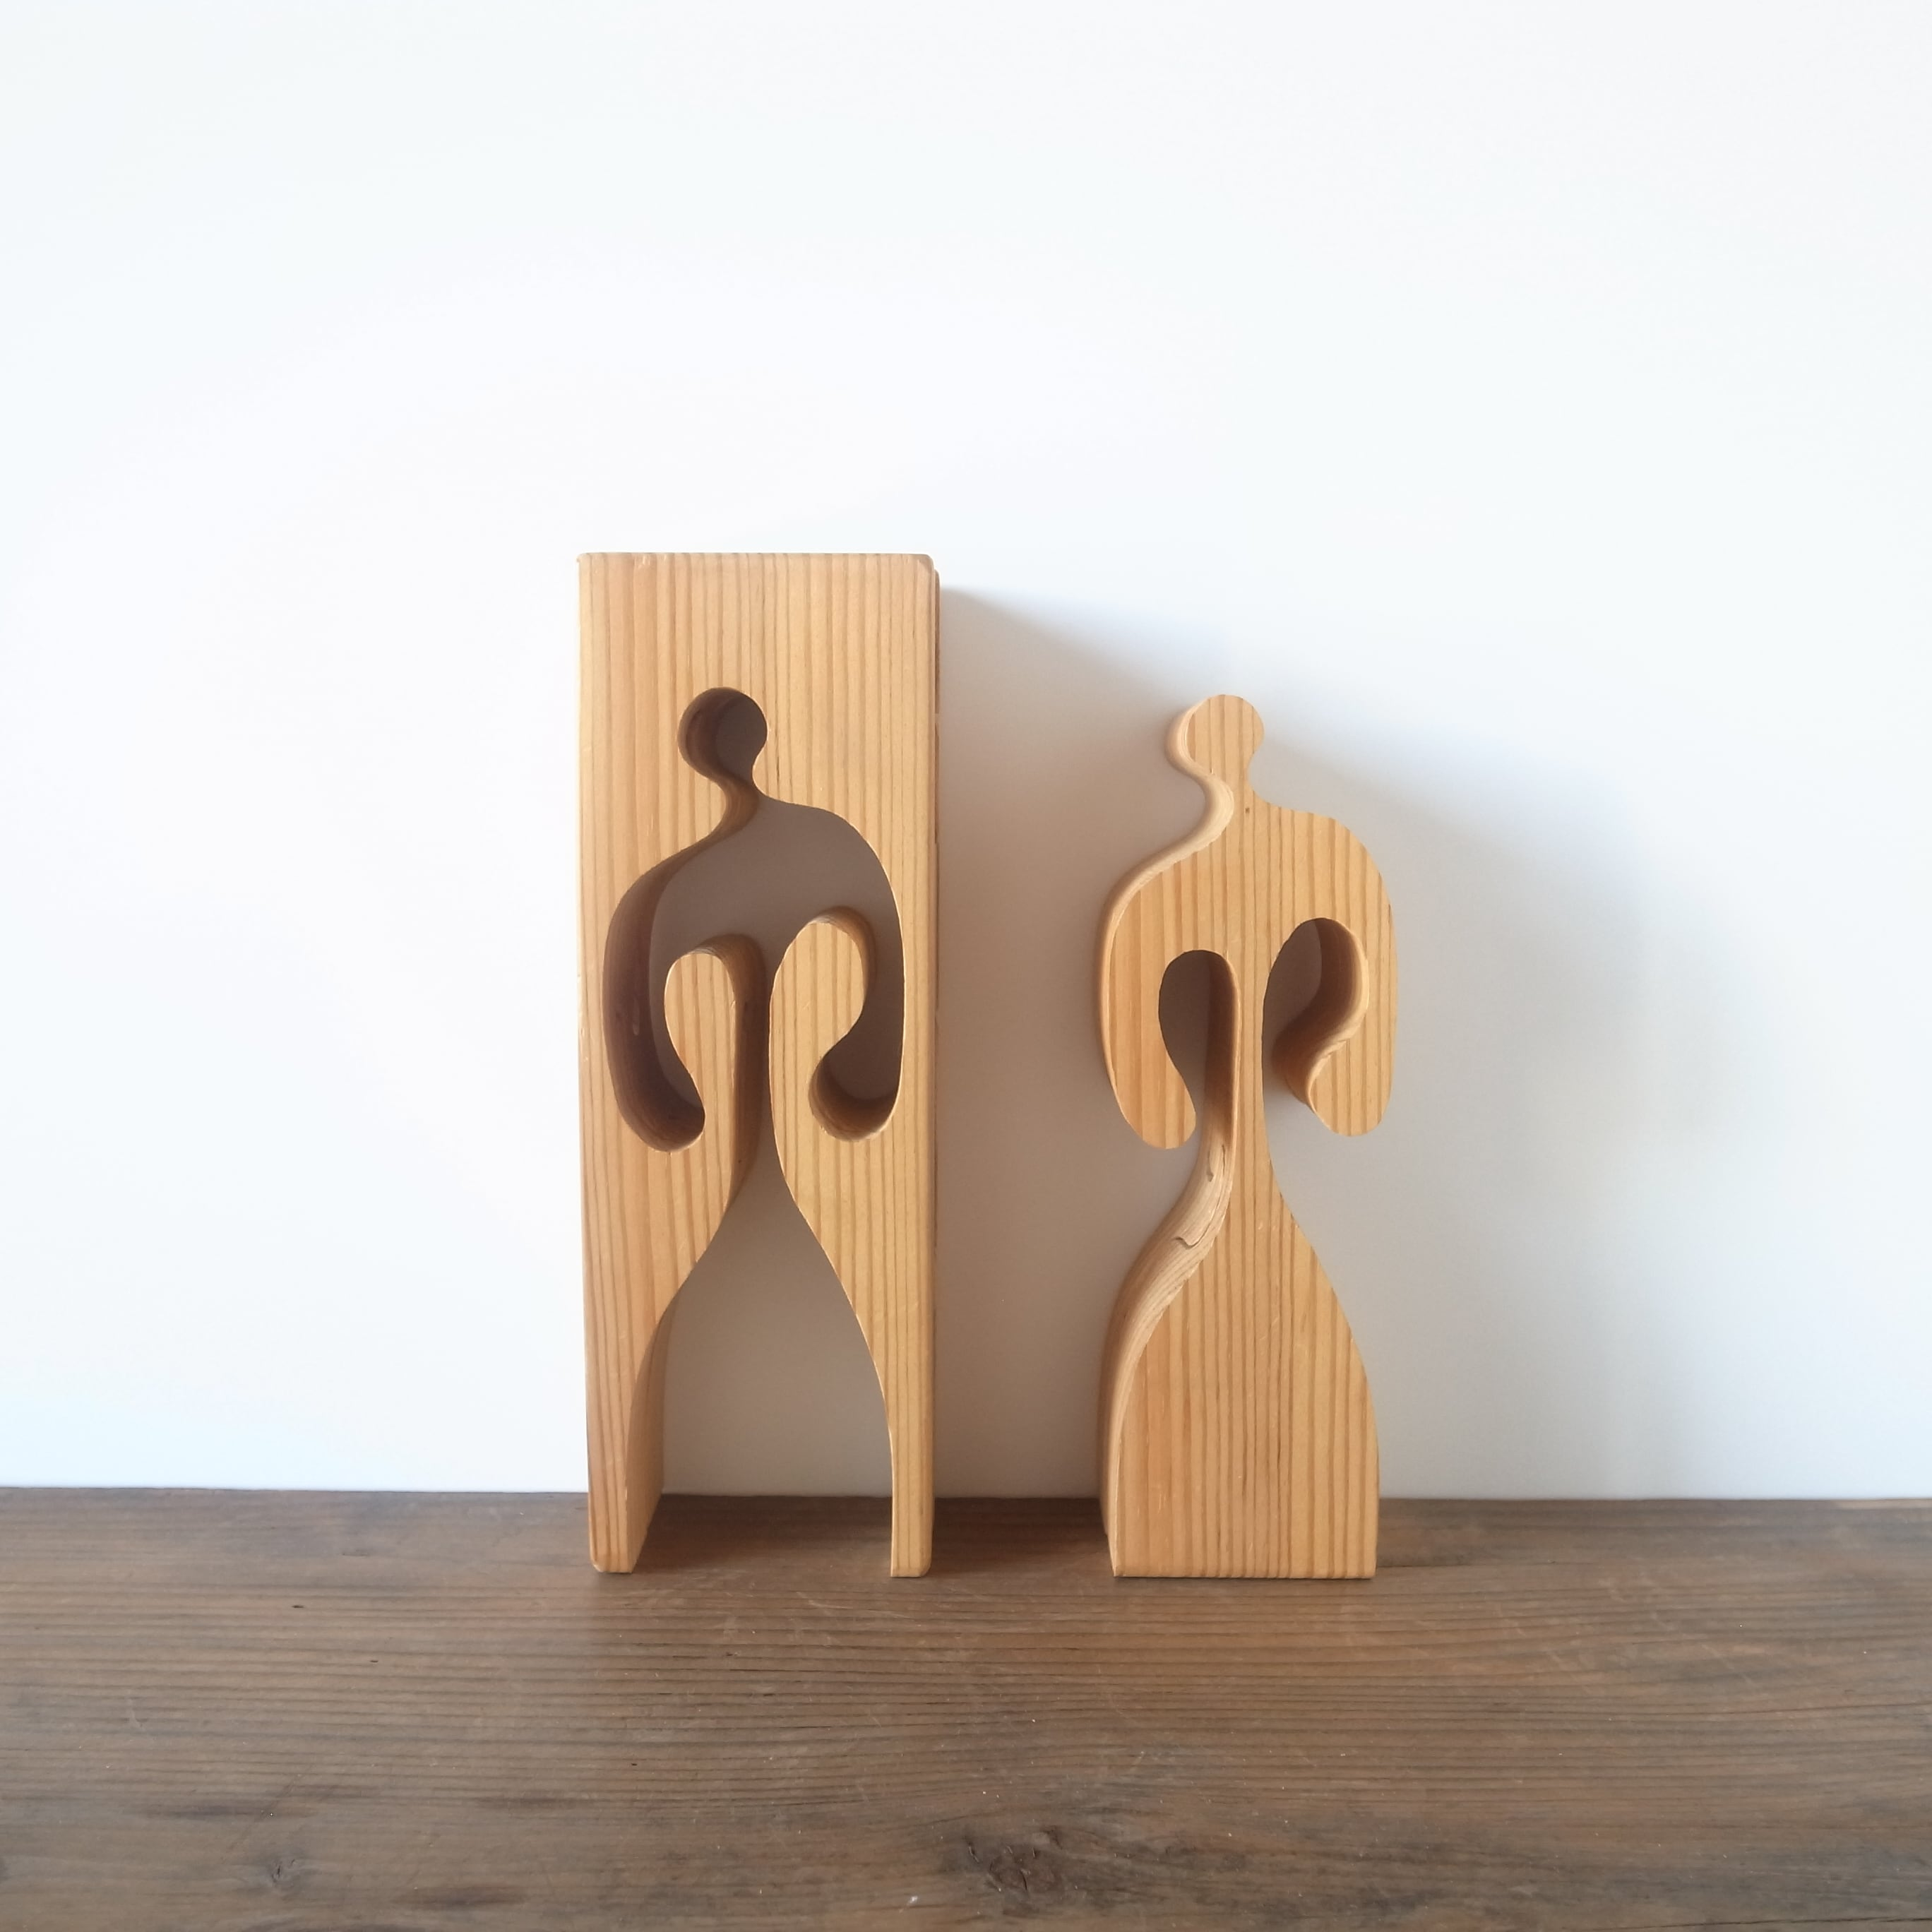 Gunnar Kanevad / Wooden puzzle sculpture